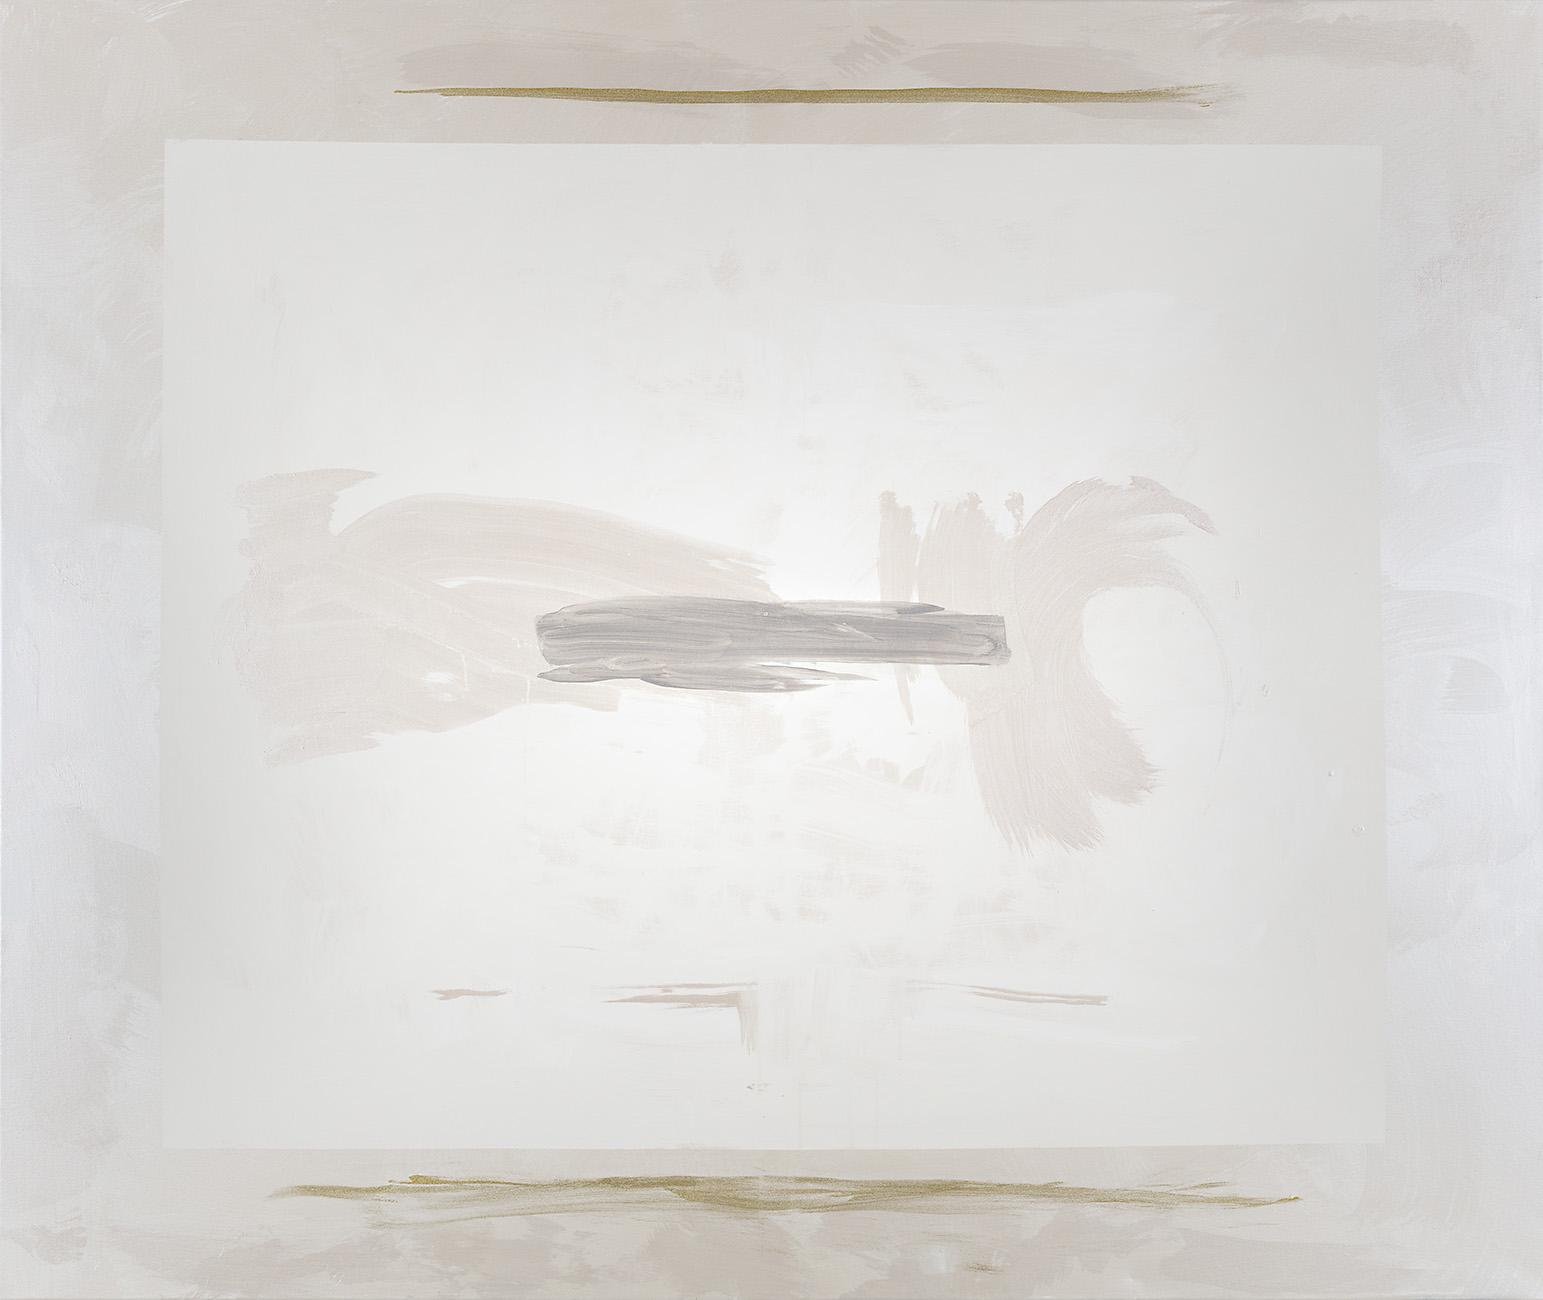 170x190 cm, Acryl auf Leinwand